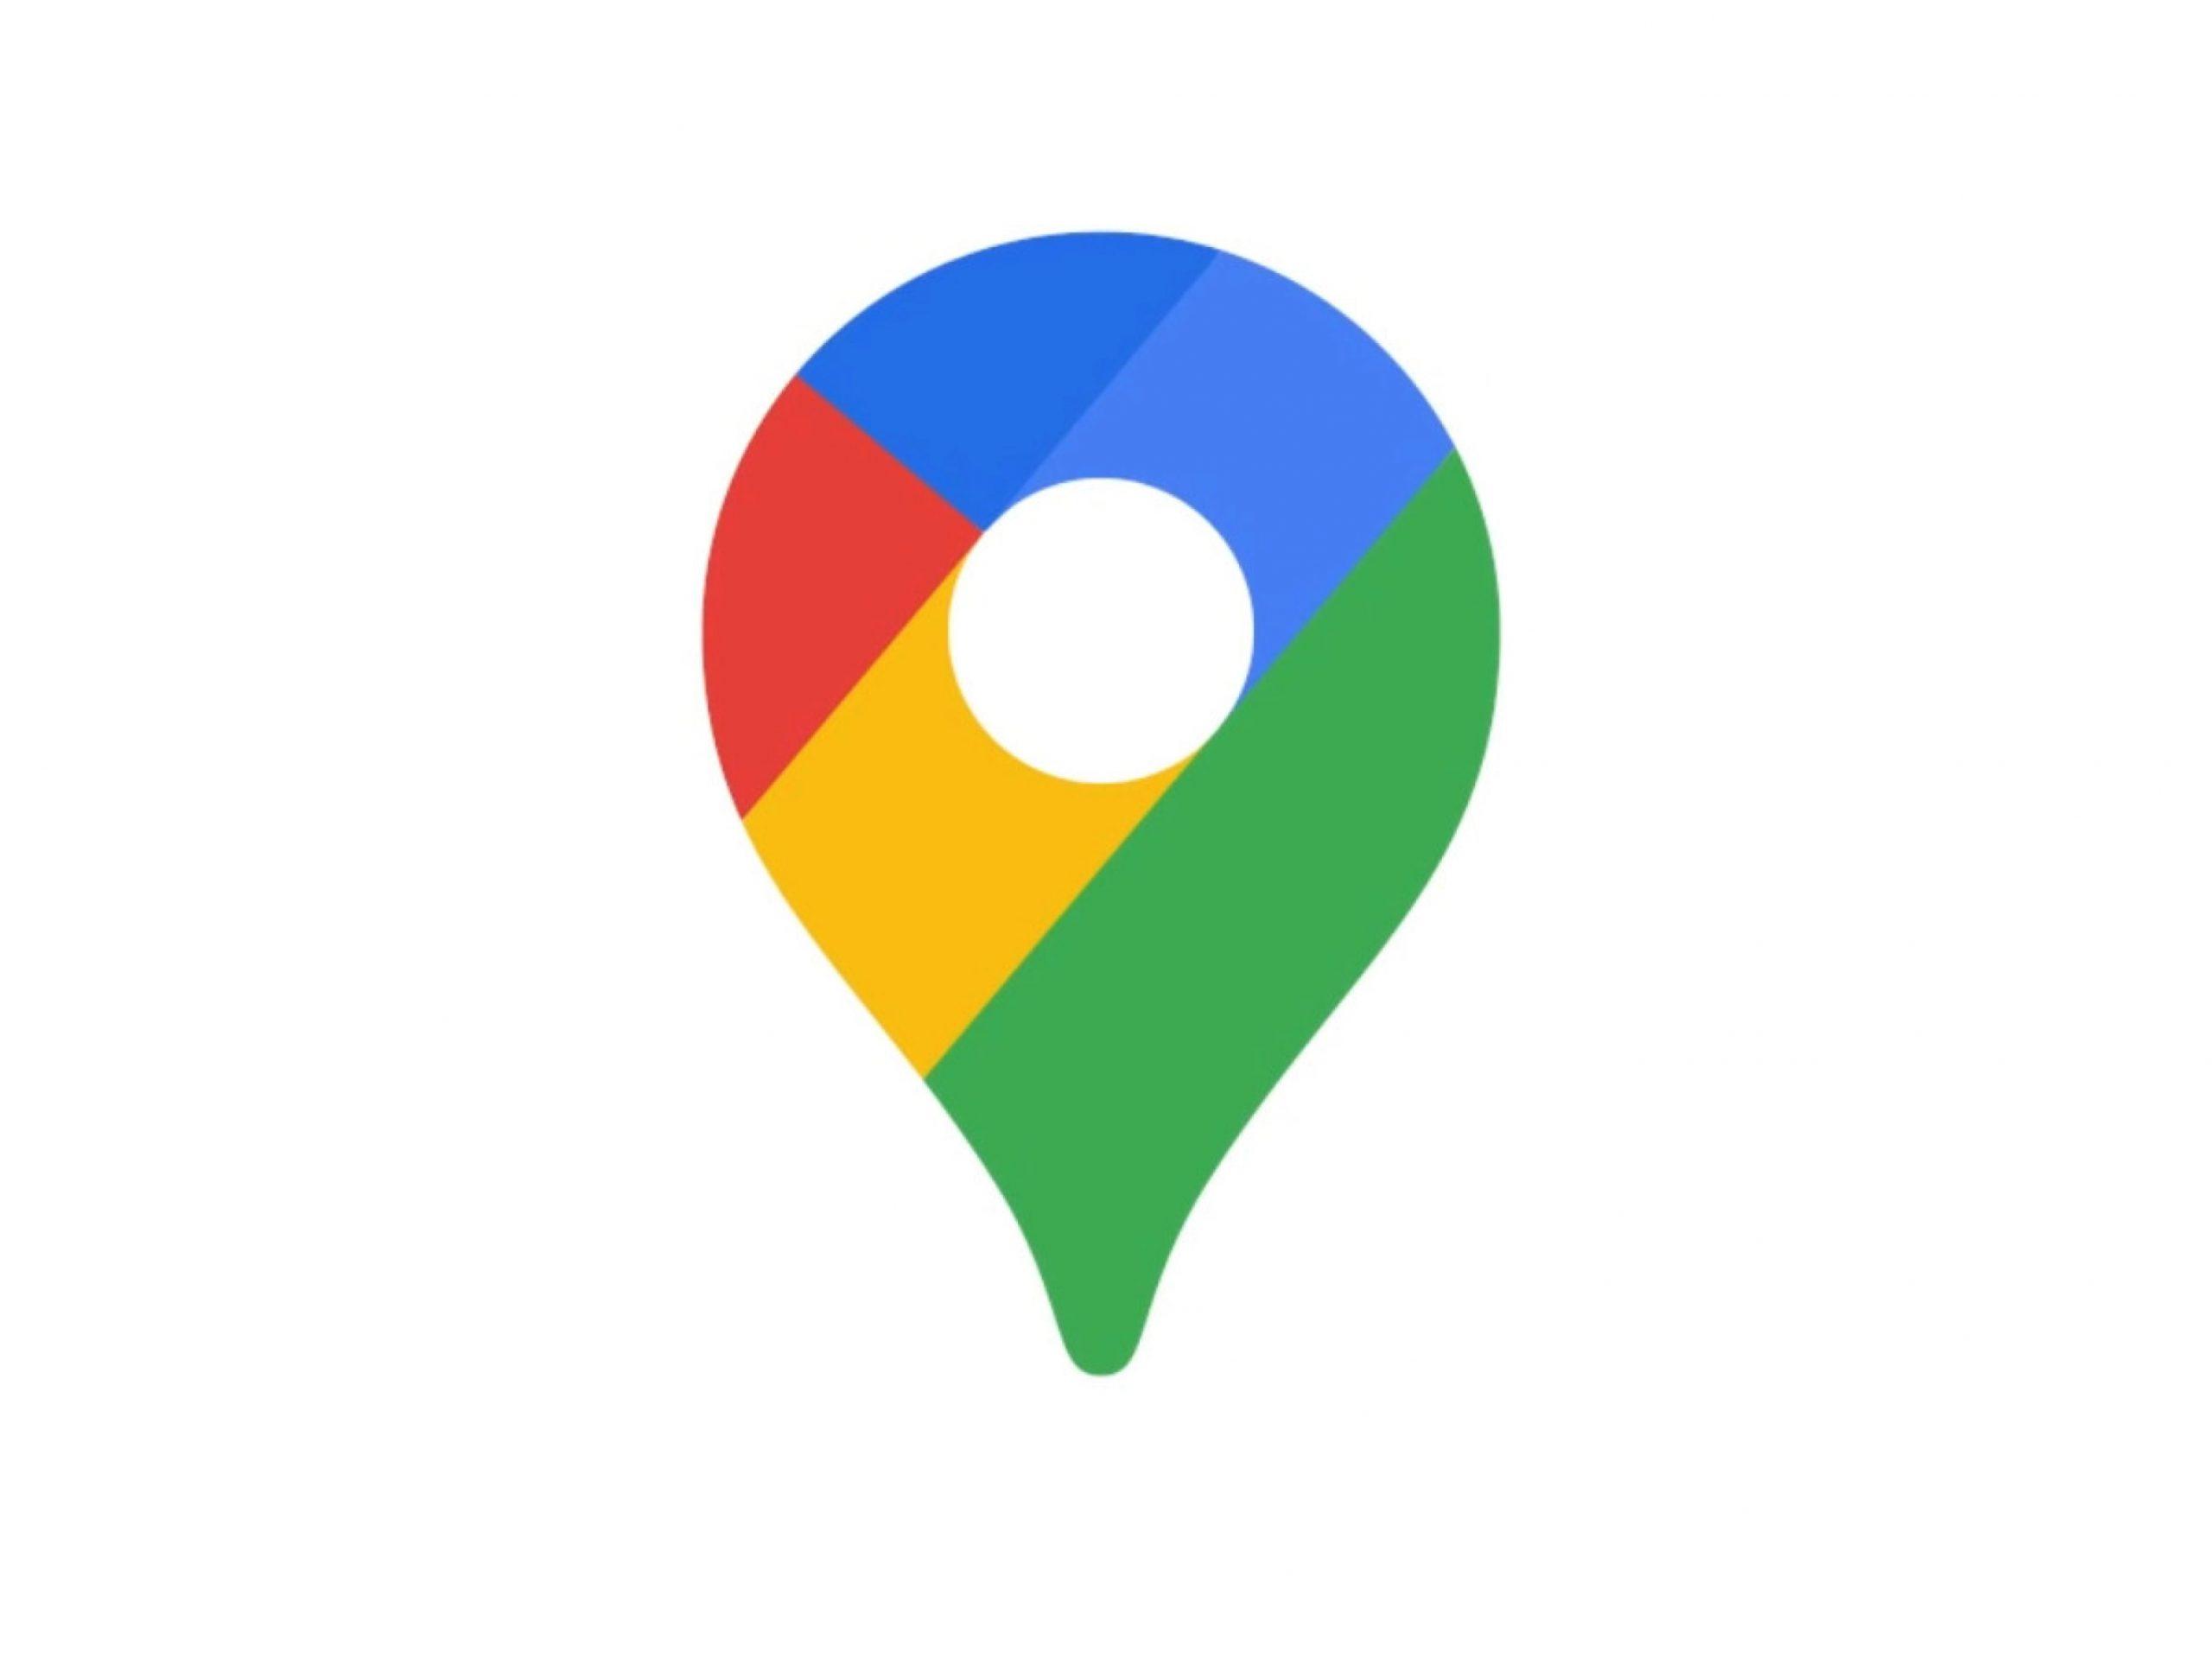 googlemaps2020-scaled